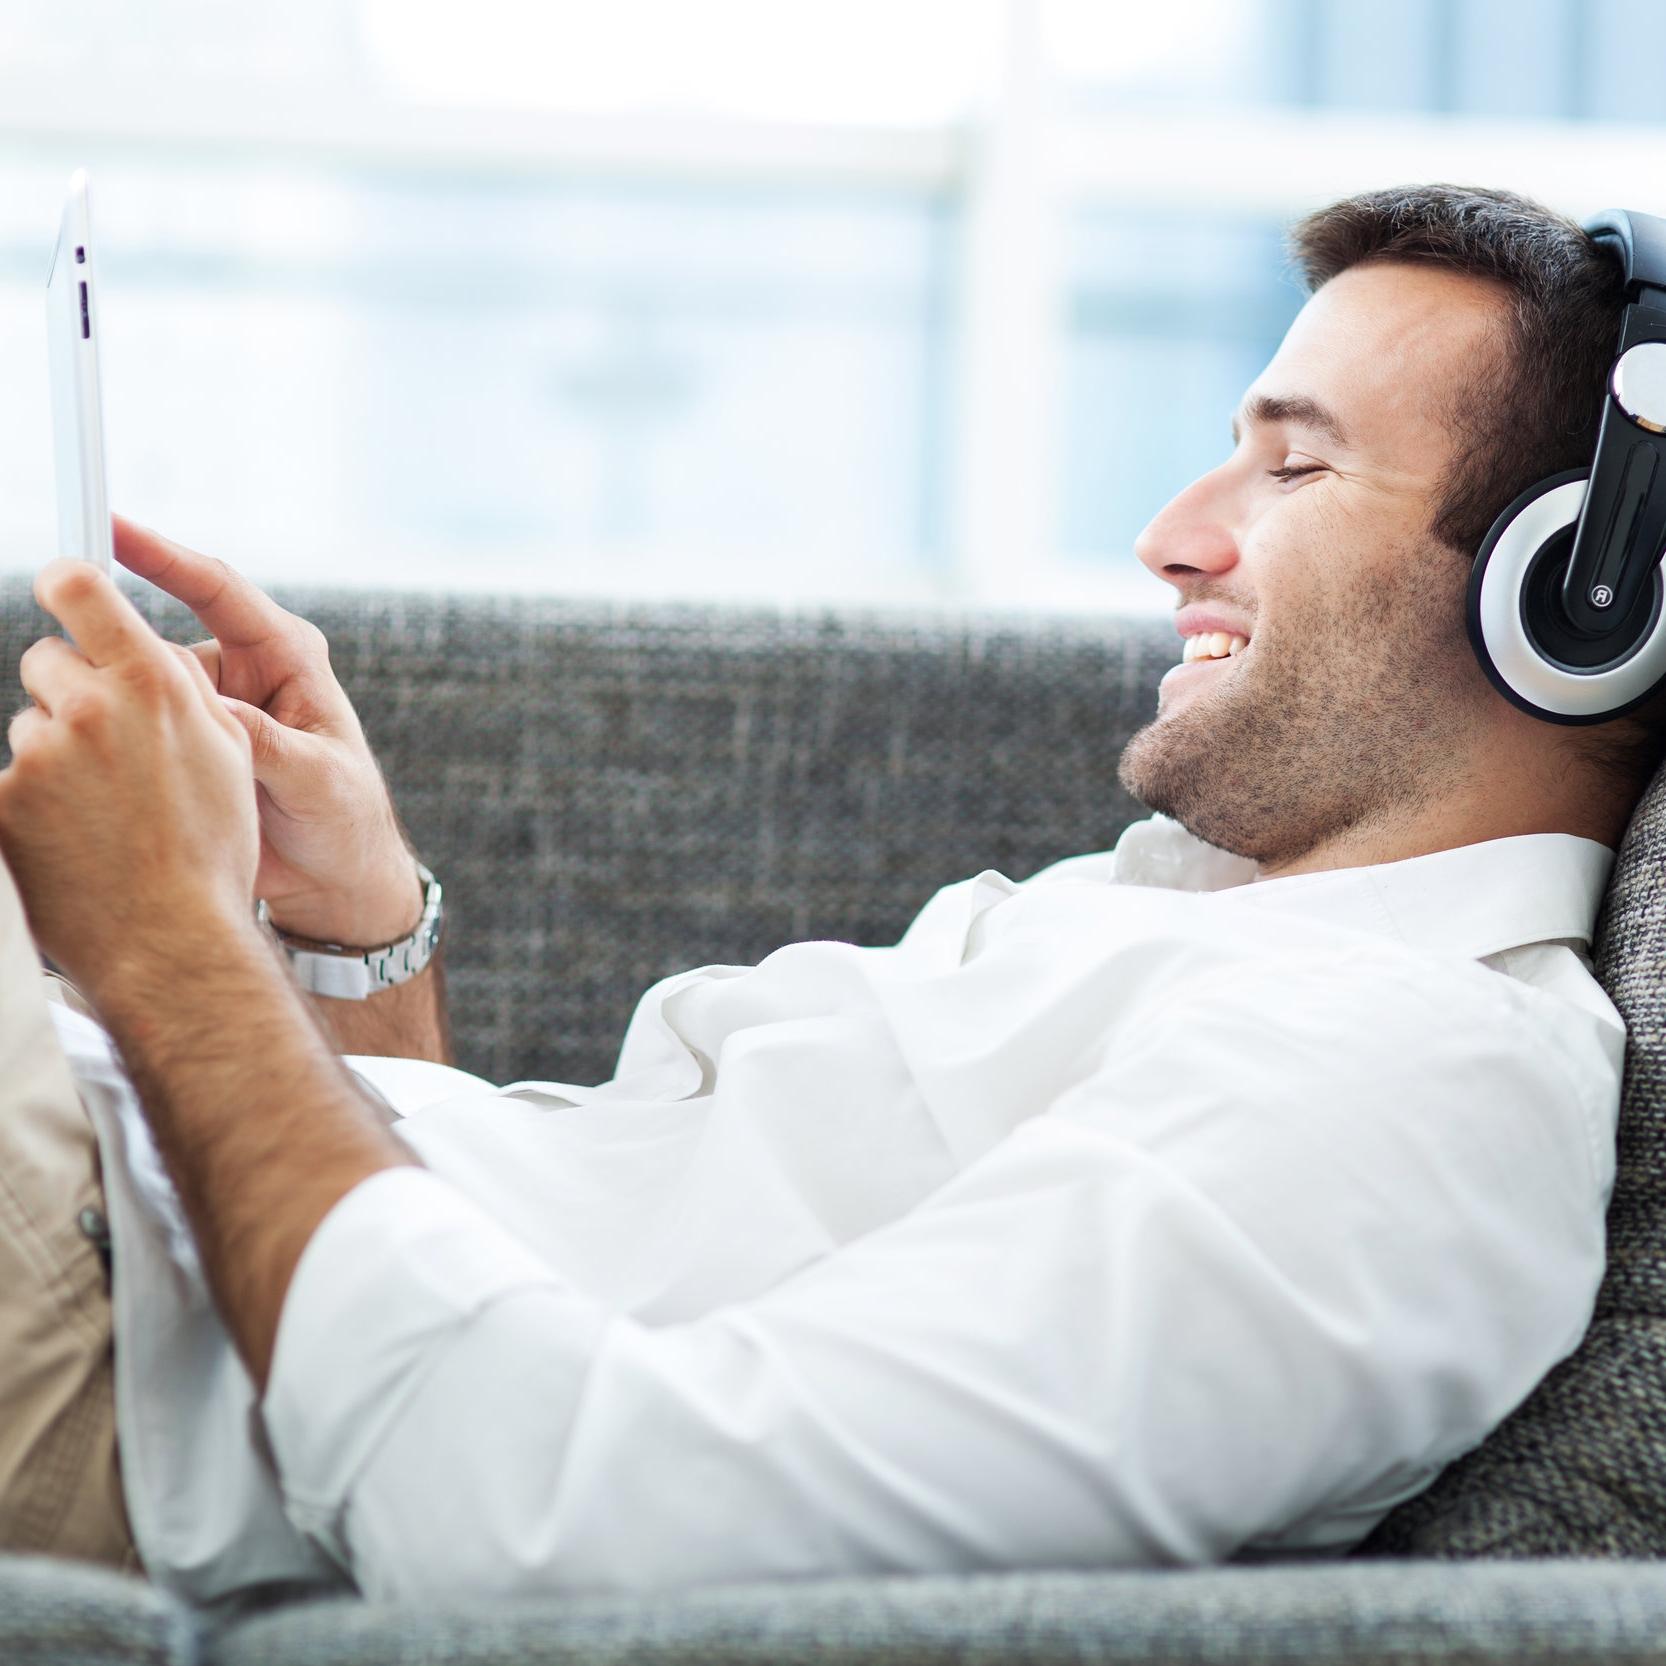 stock-photo-man-on-sofa-with-headphones-and-digital-tablet-142213039.jpg